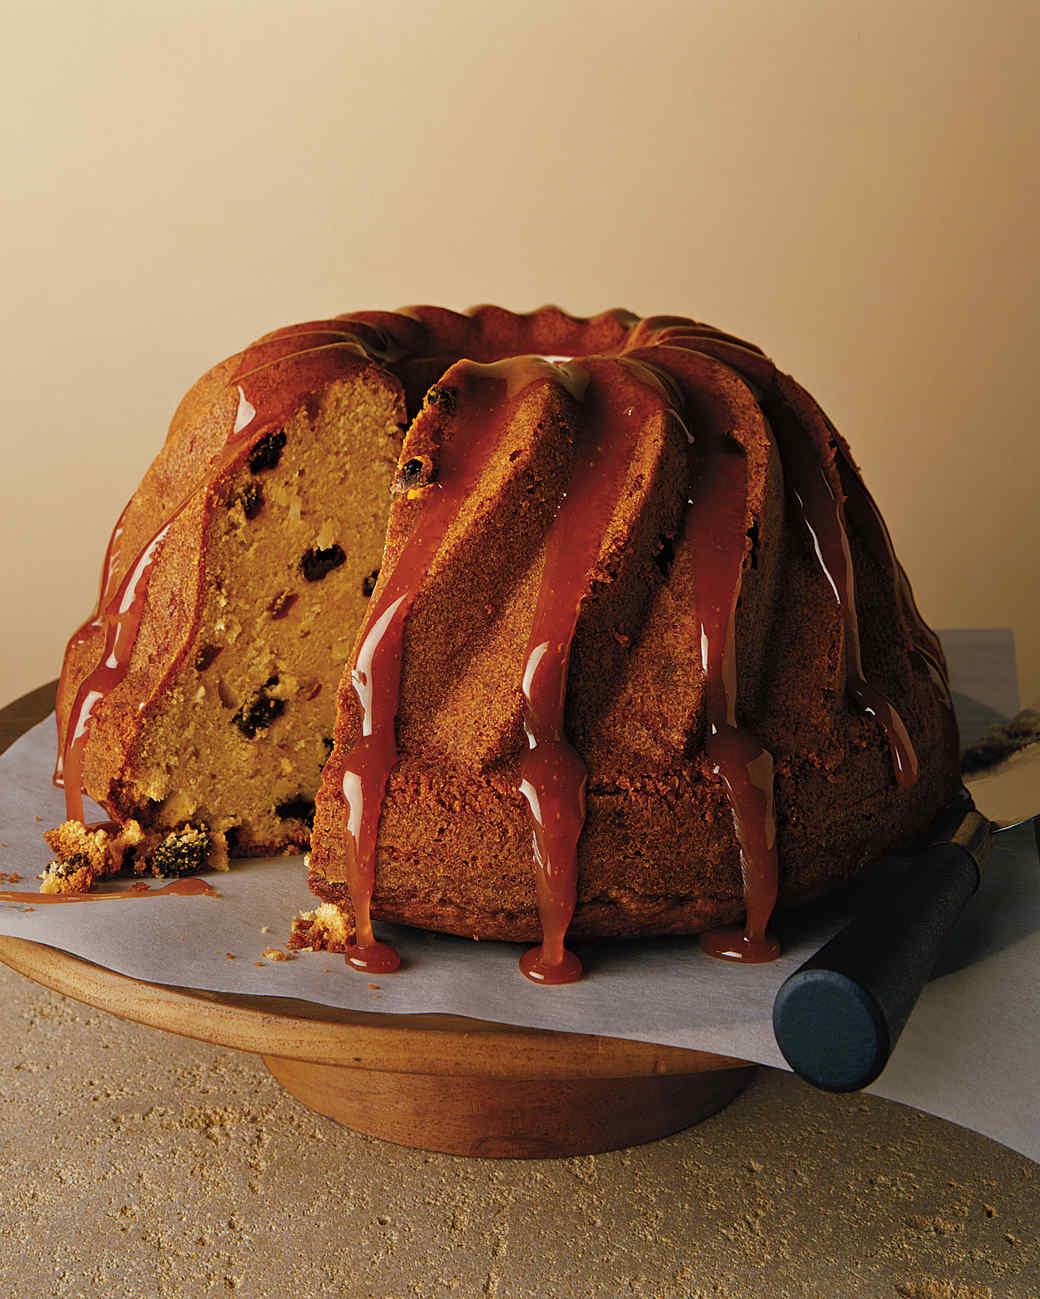 Coconut Rum-Raisin Bundt Cake with Rum-Caramel Glaze